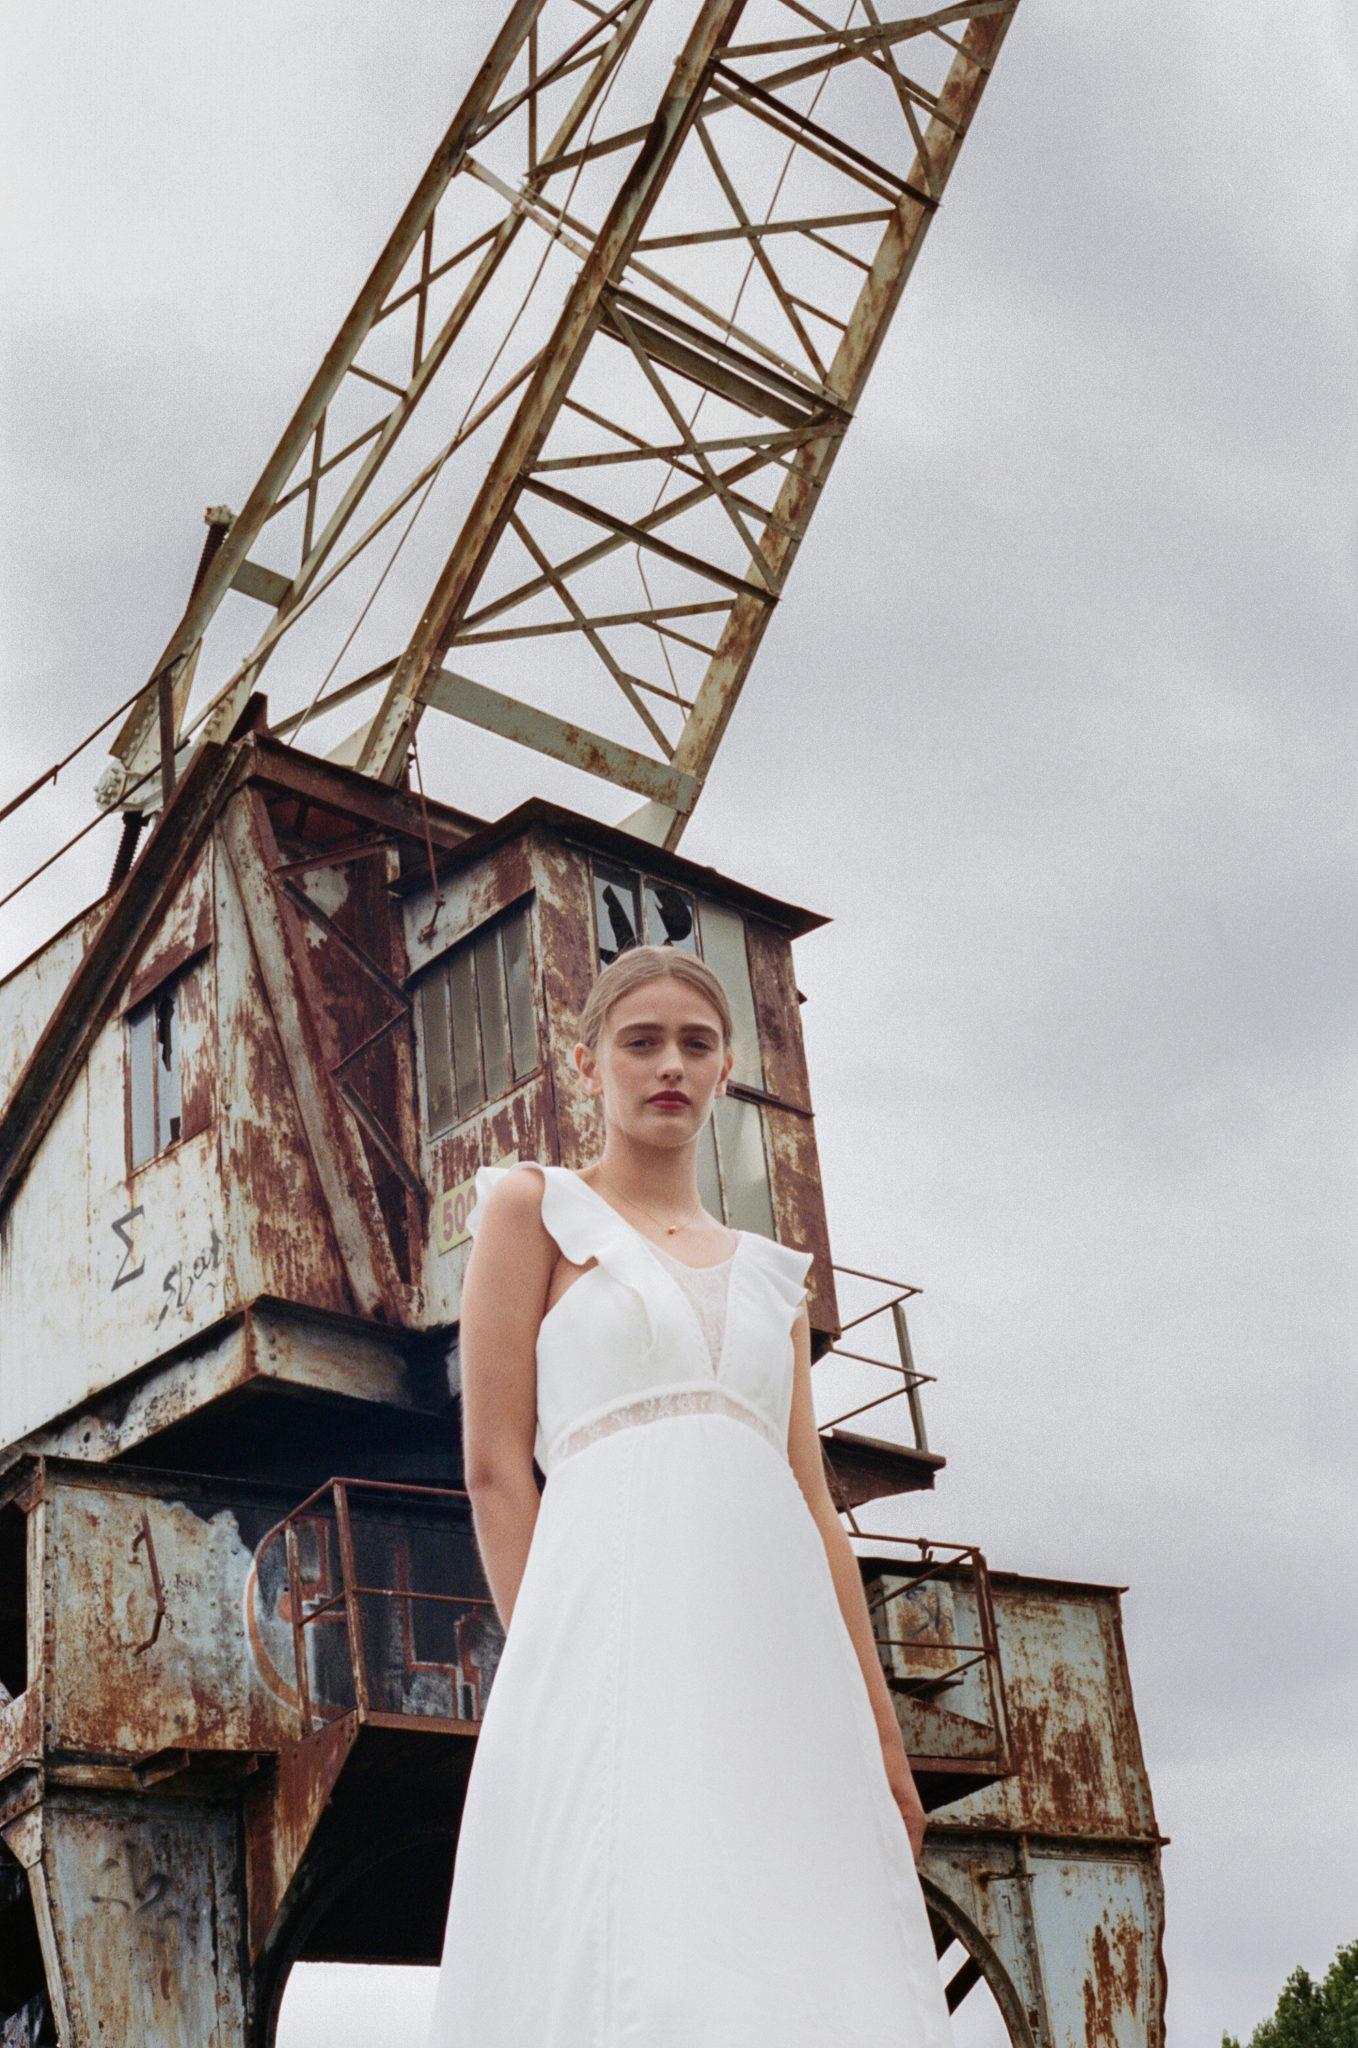 Le Wedding Urban Brides robe Mademoiselle O Presqu'île Caen